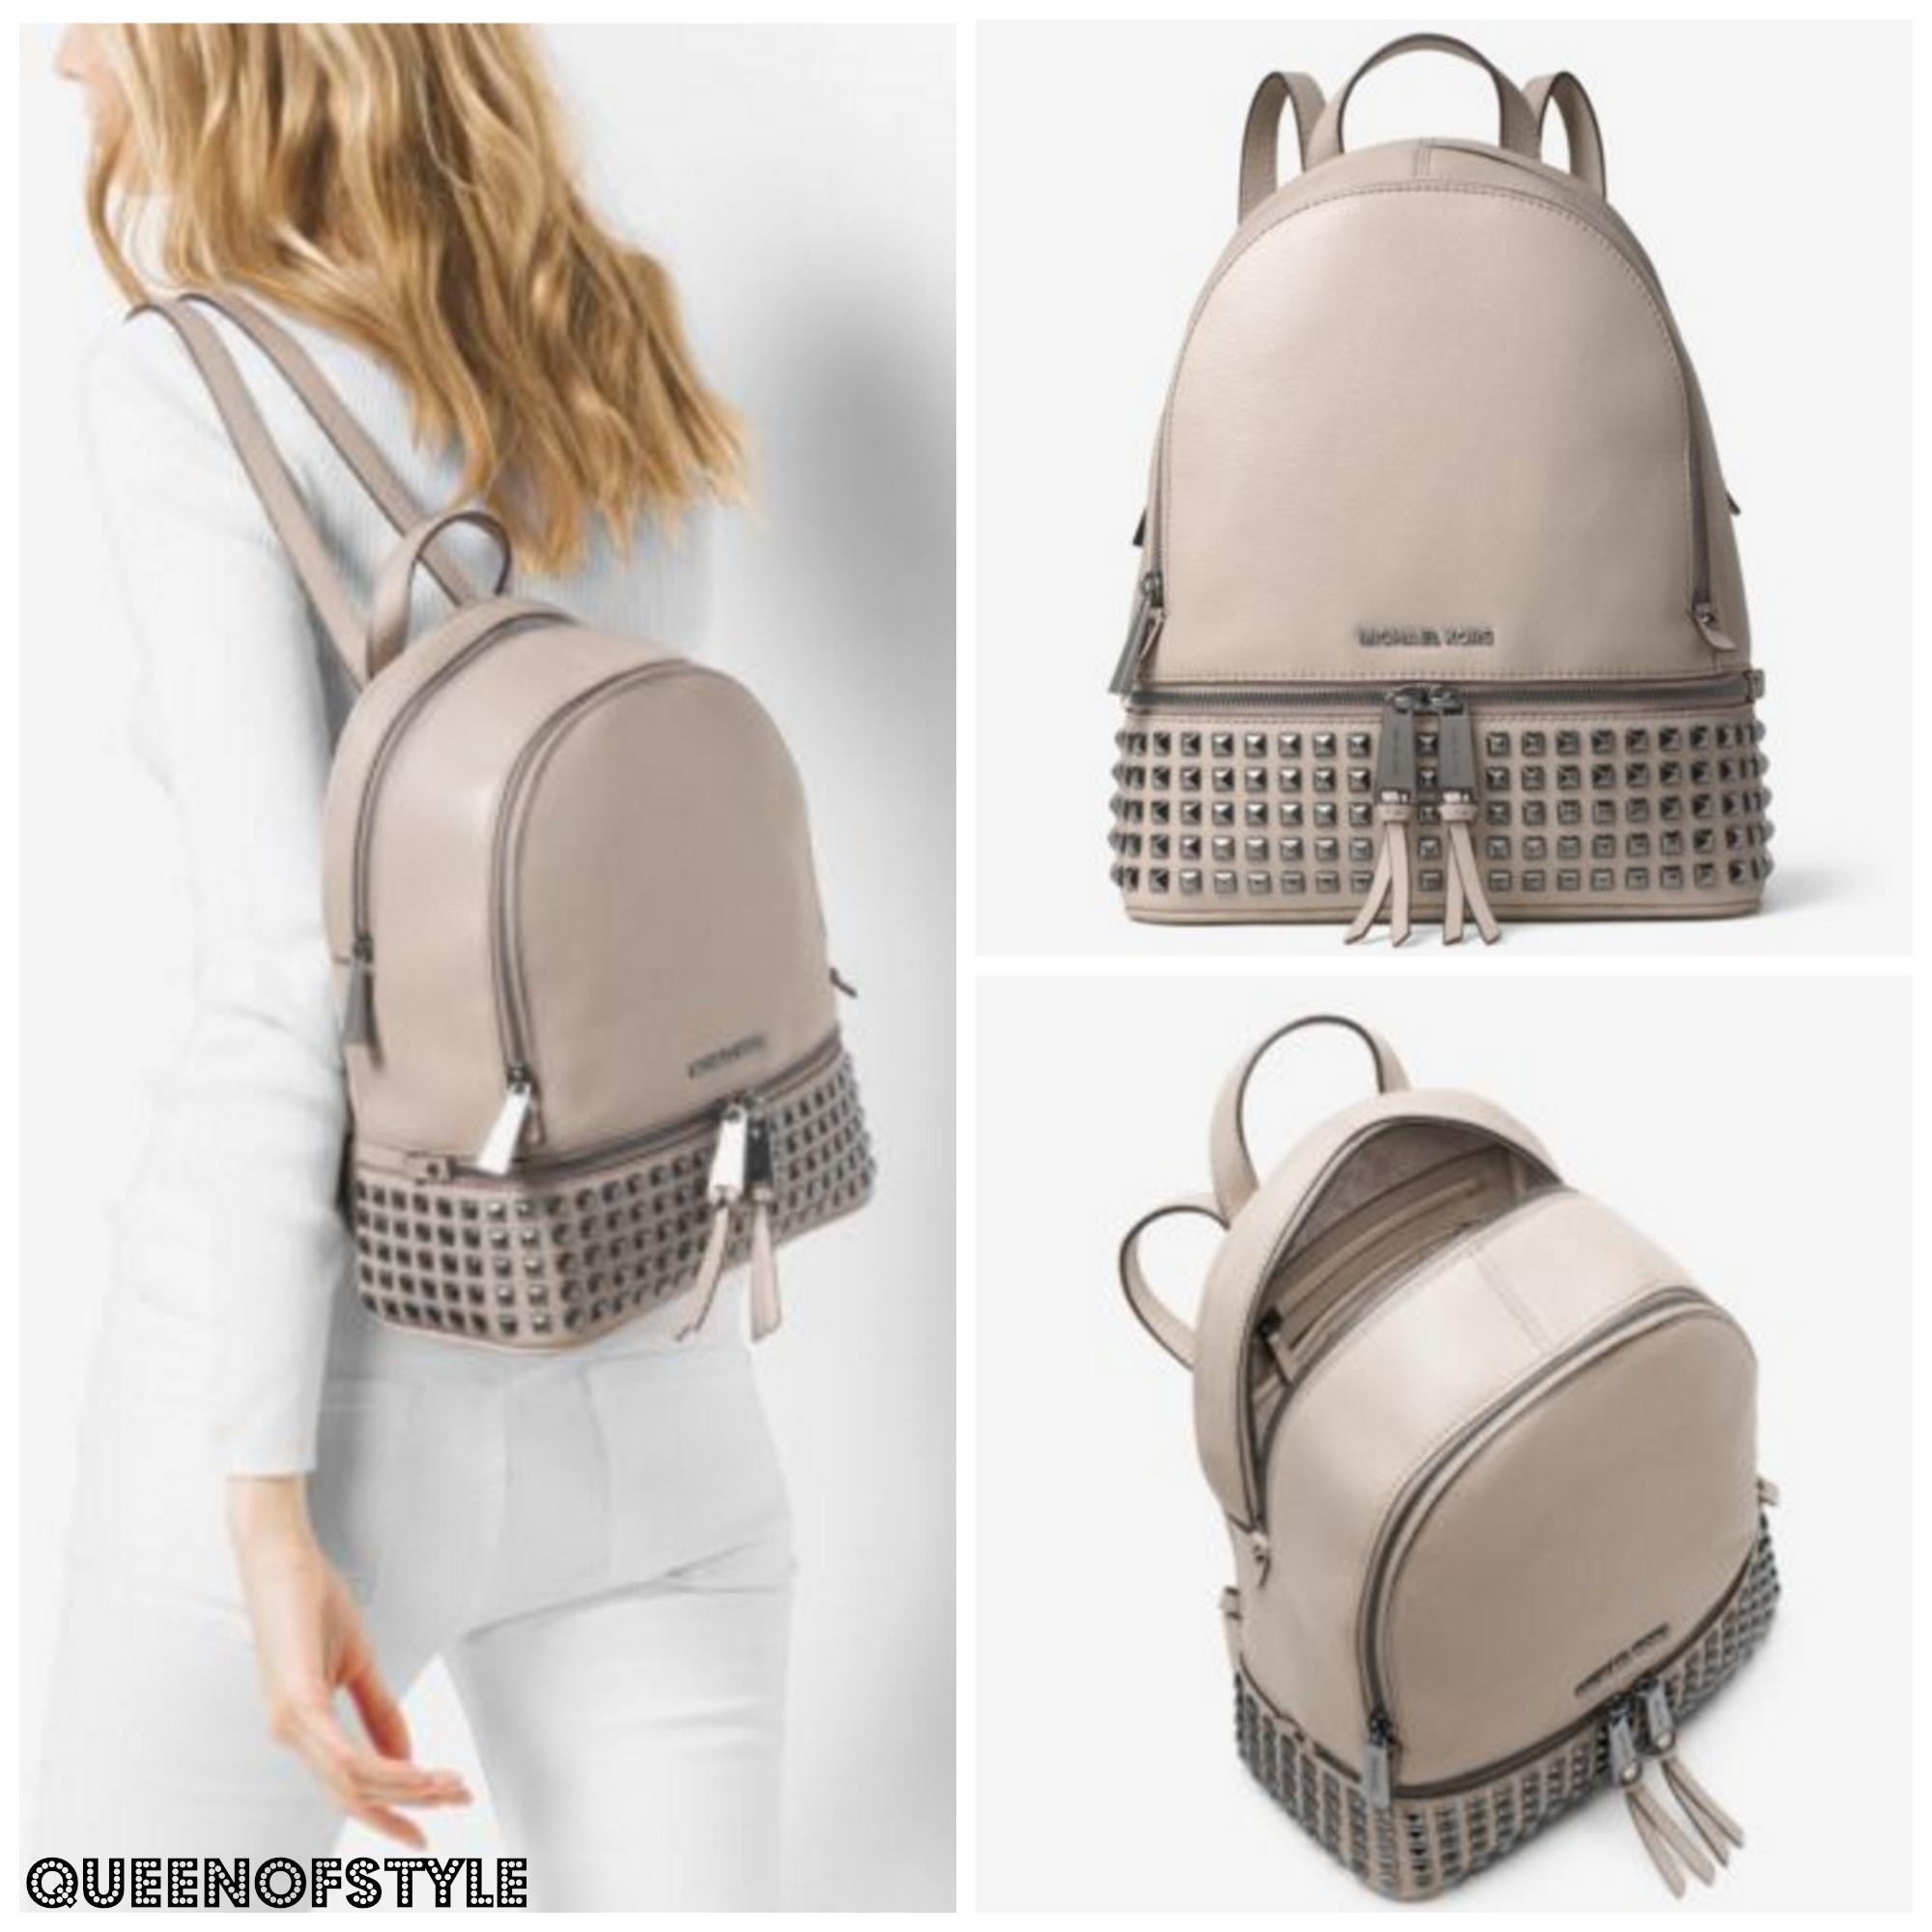 cad0048a81a8 michael kors rhea medium studded backpack black flats size 11 ...